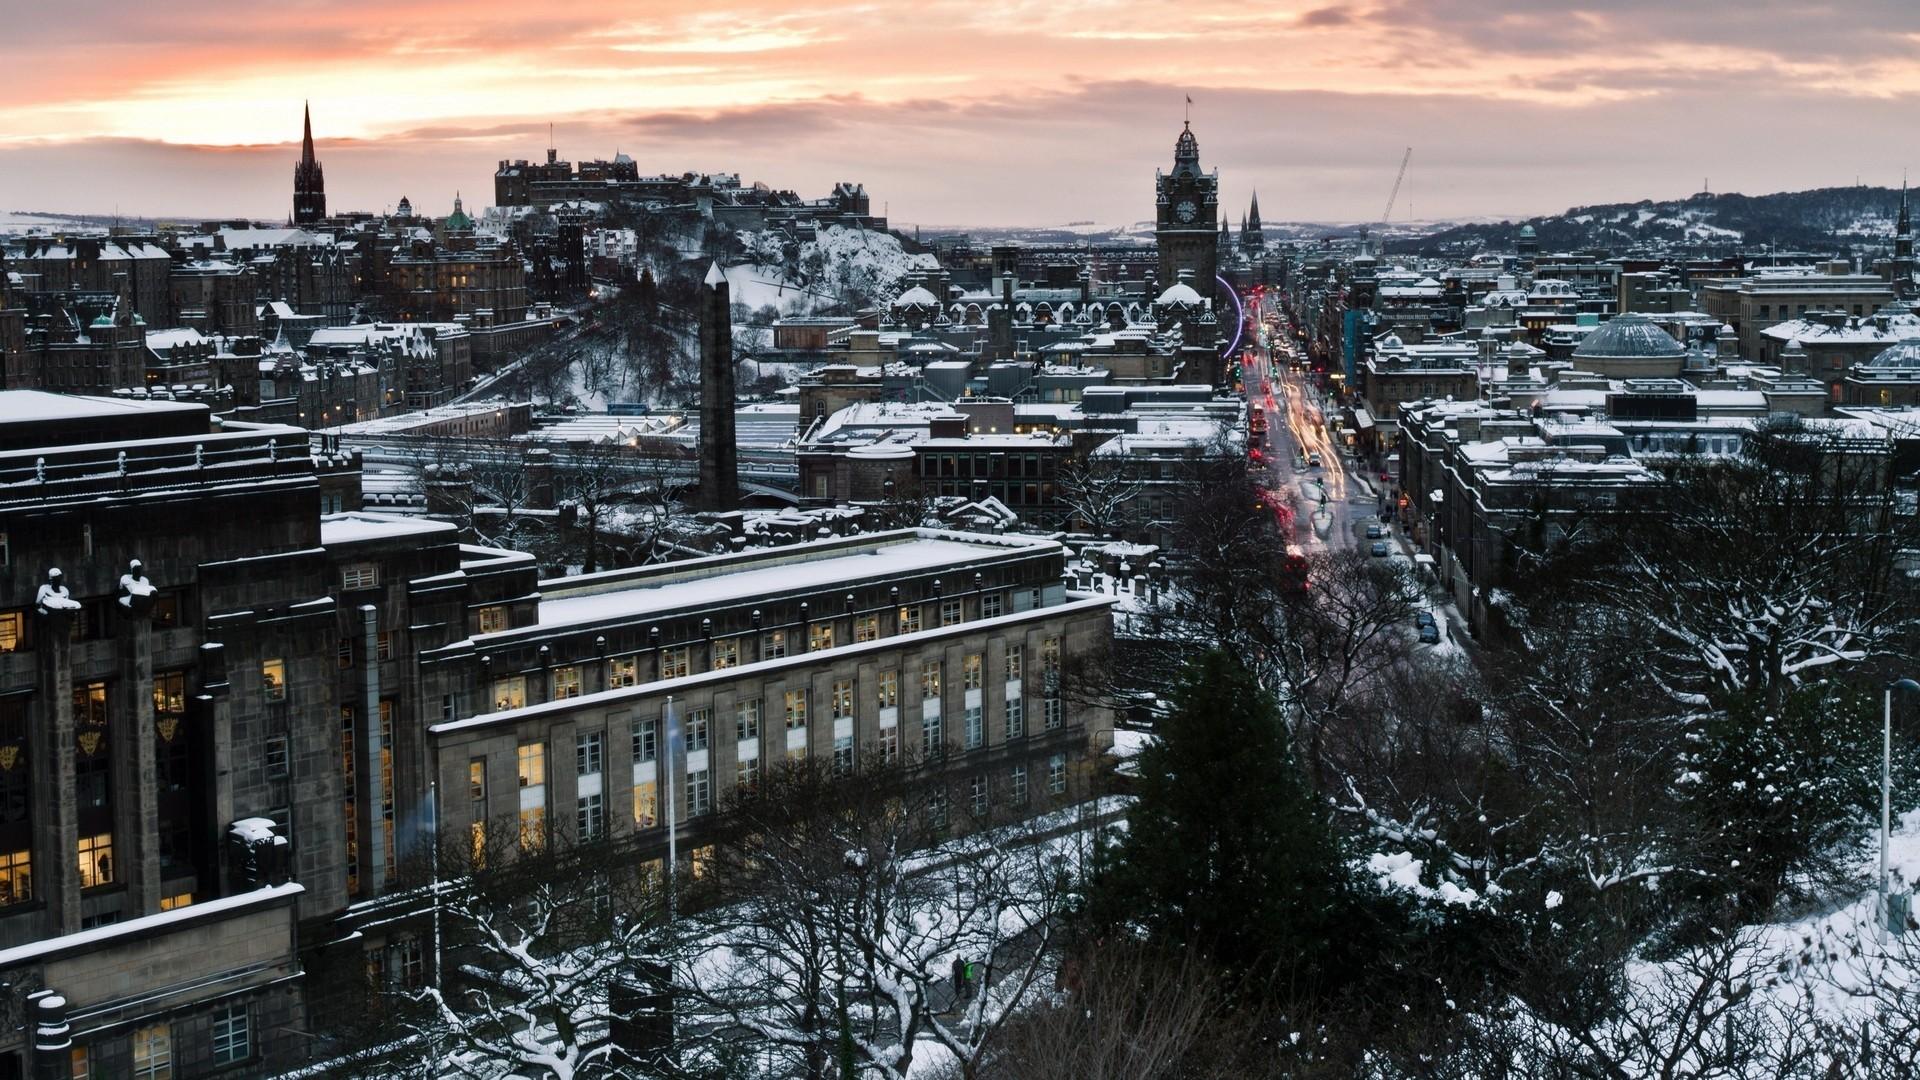 Wallpaper edinburgh, scotland, winter, snow, city